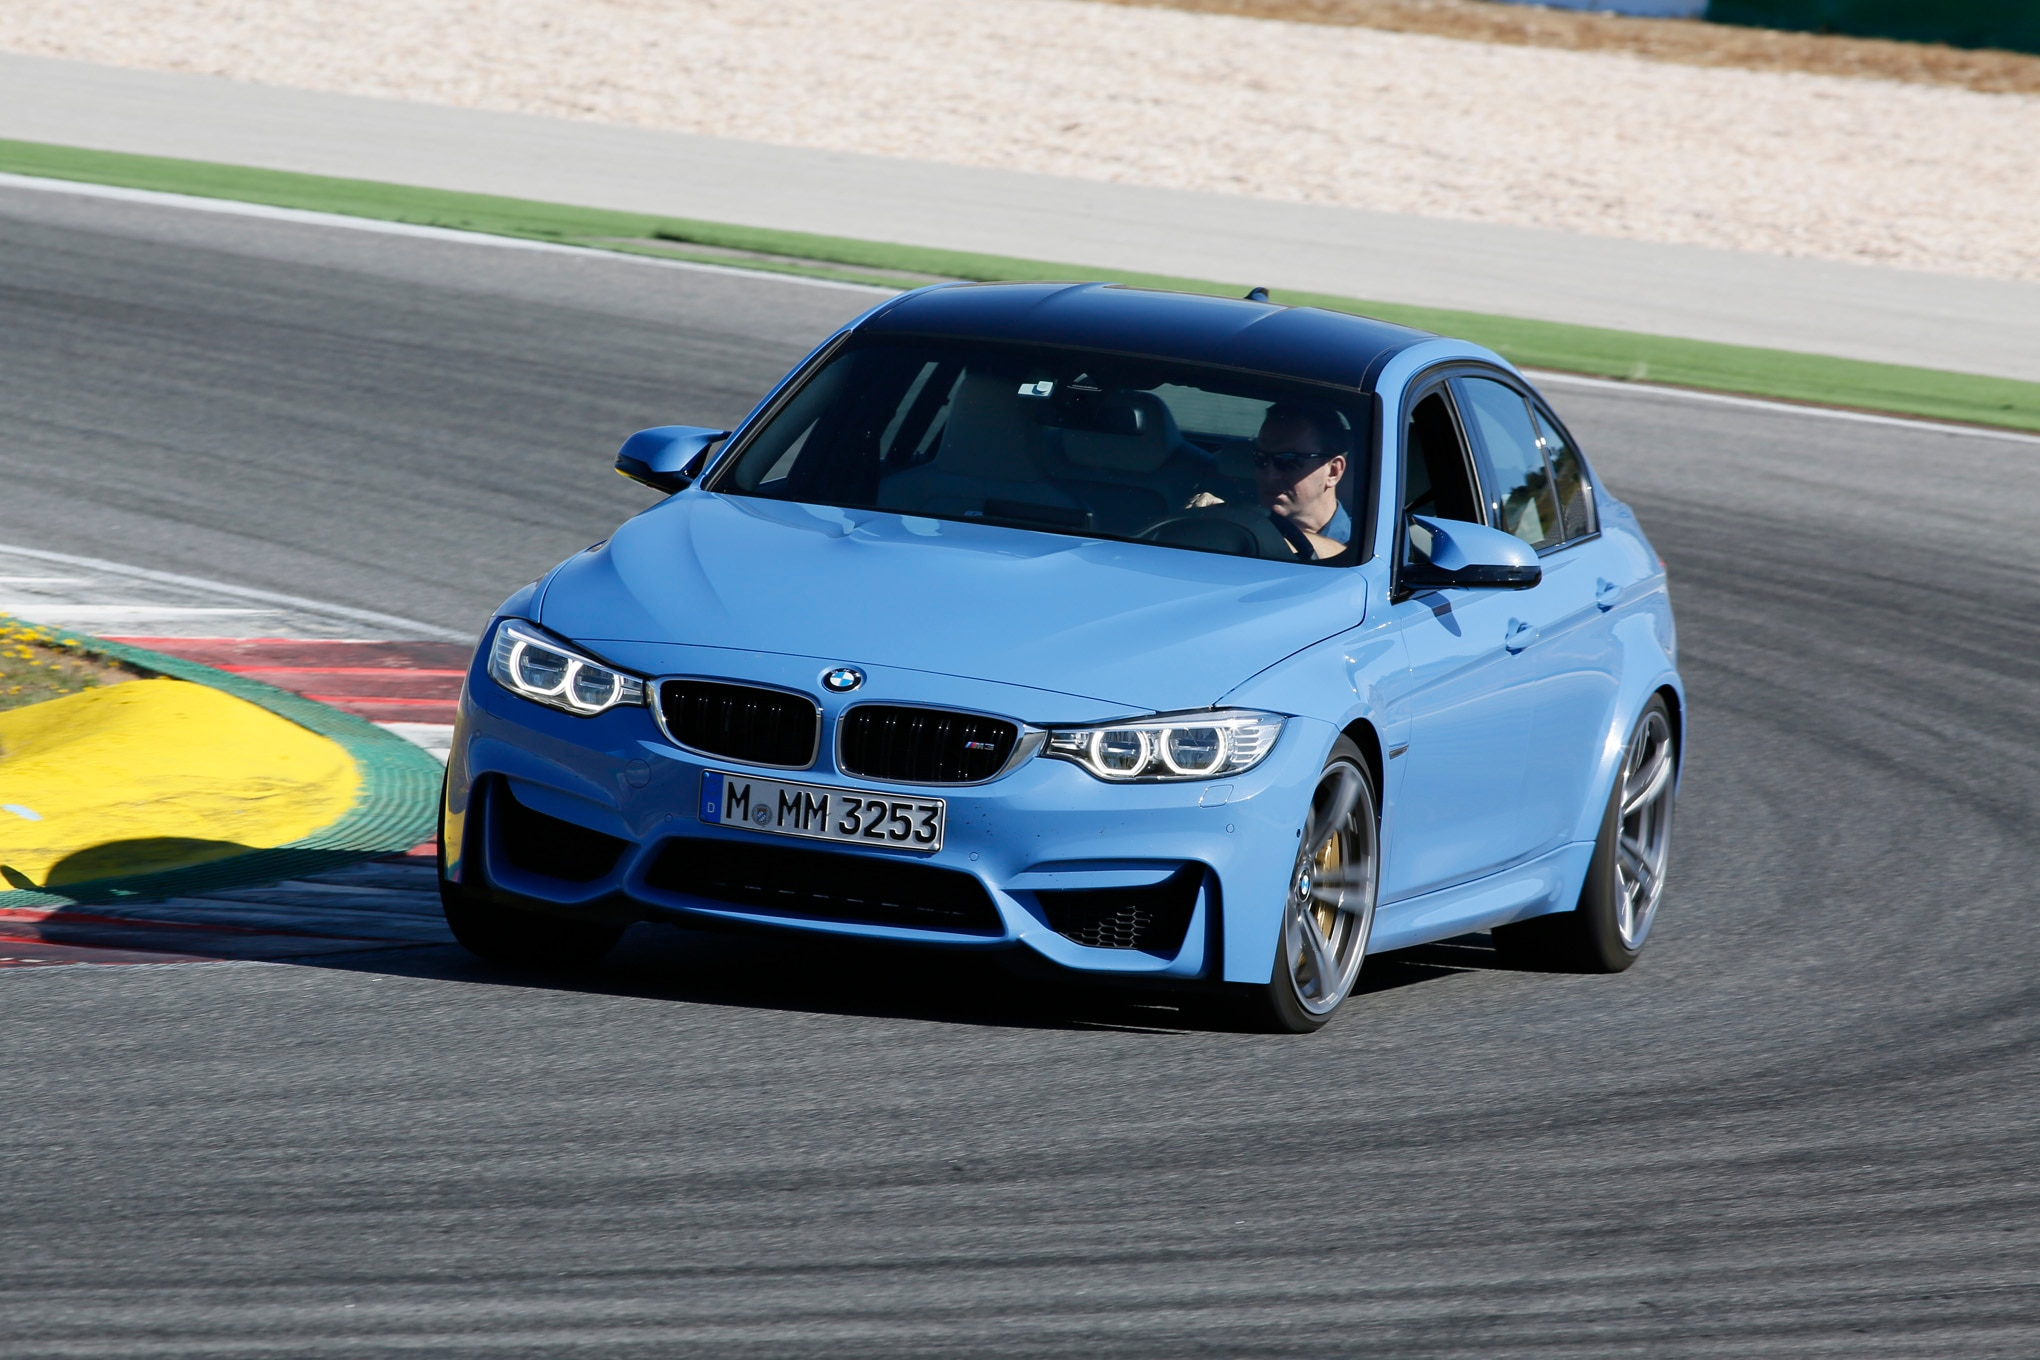 2015 BMW M3 Around the Block